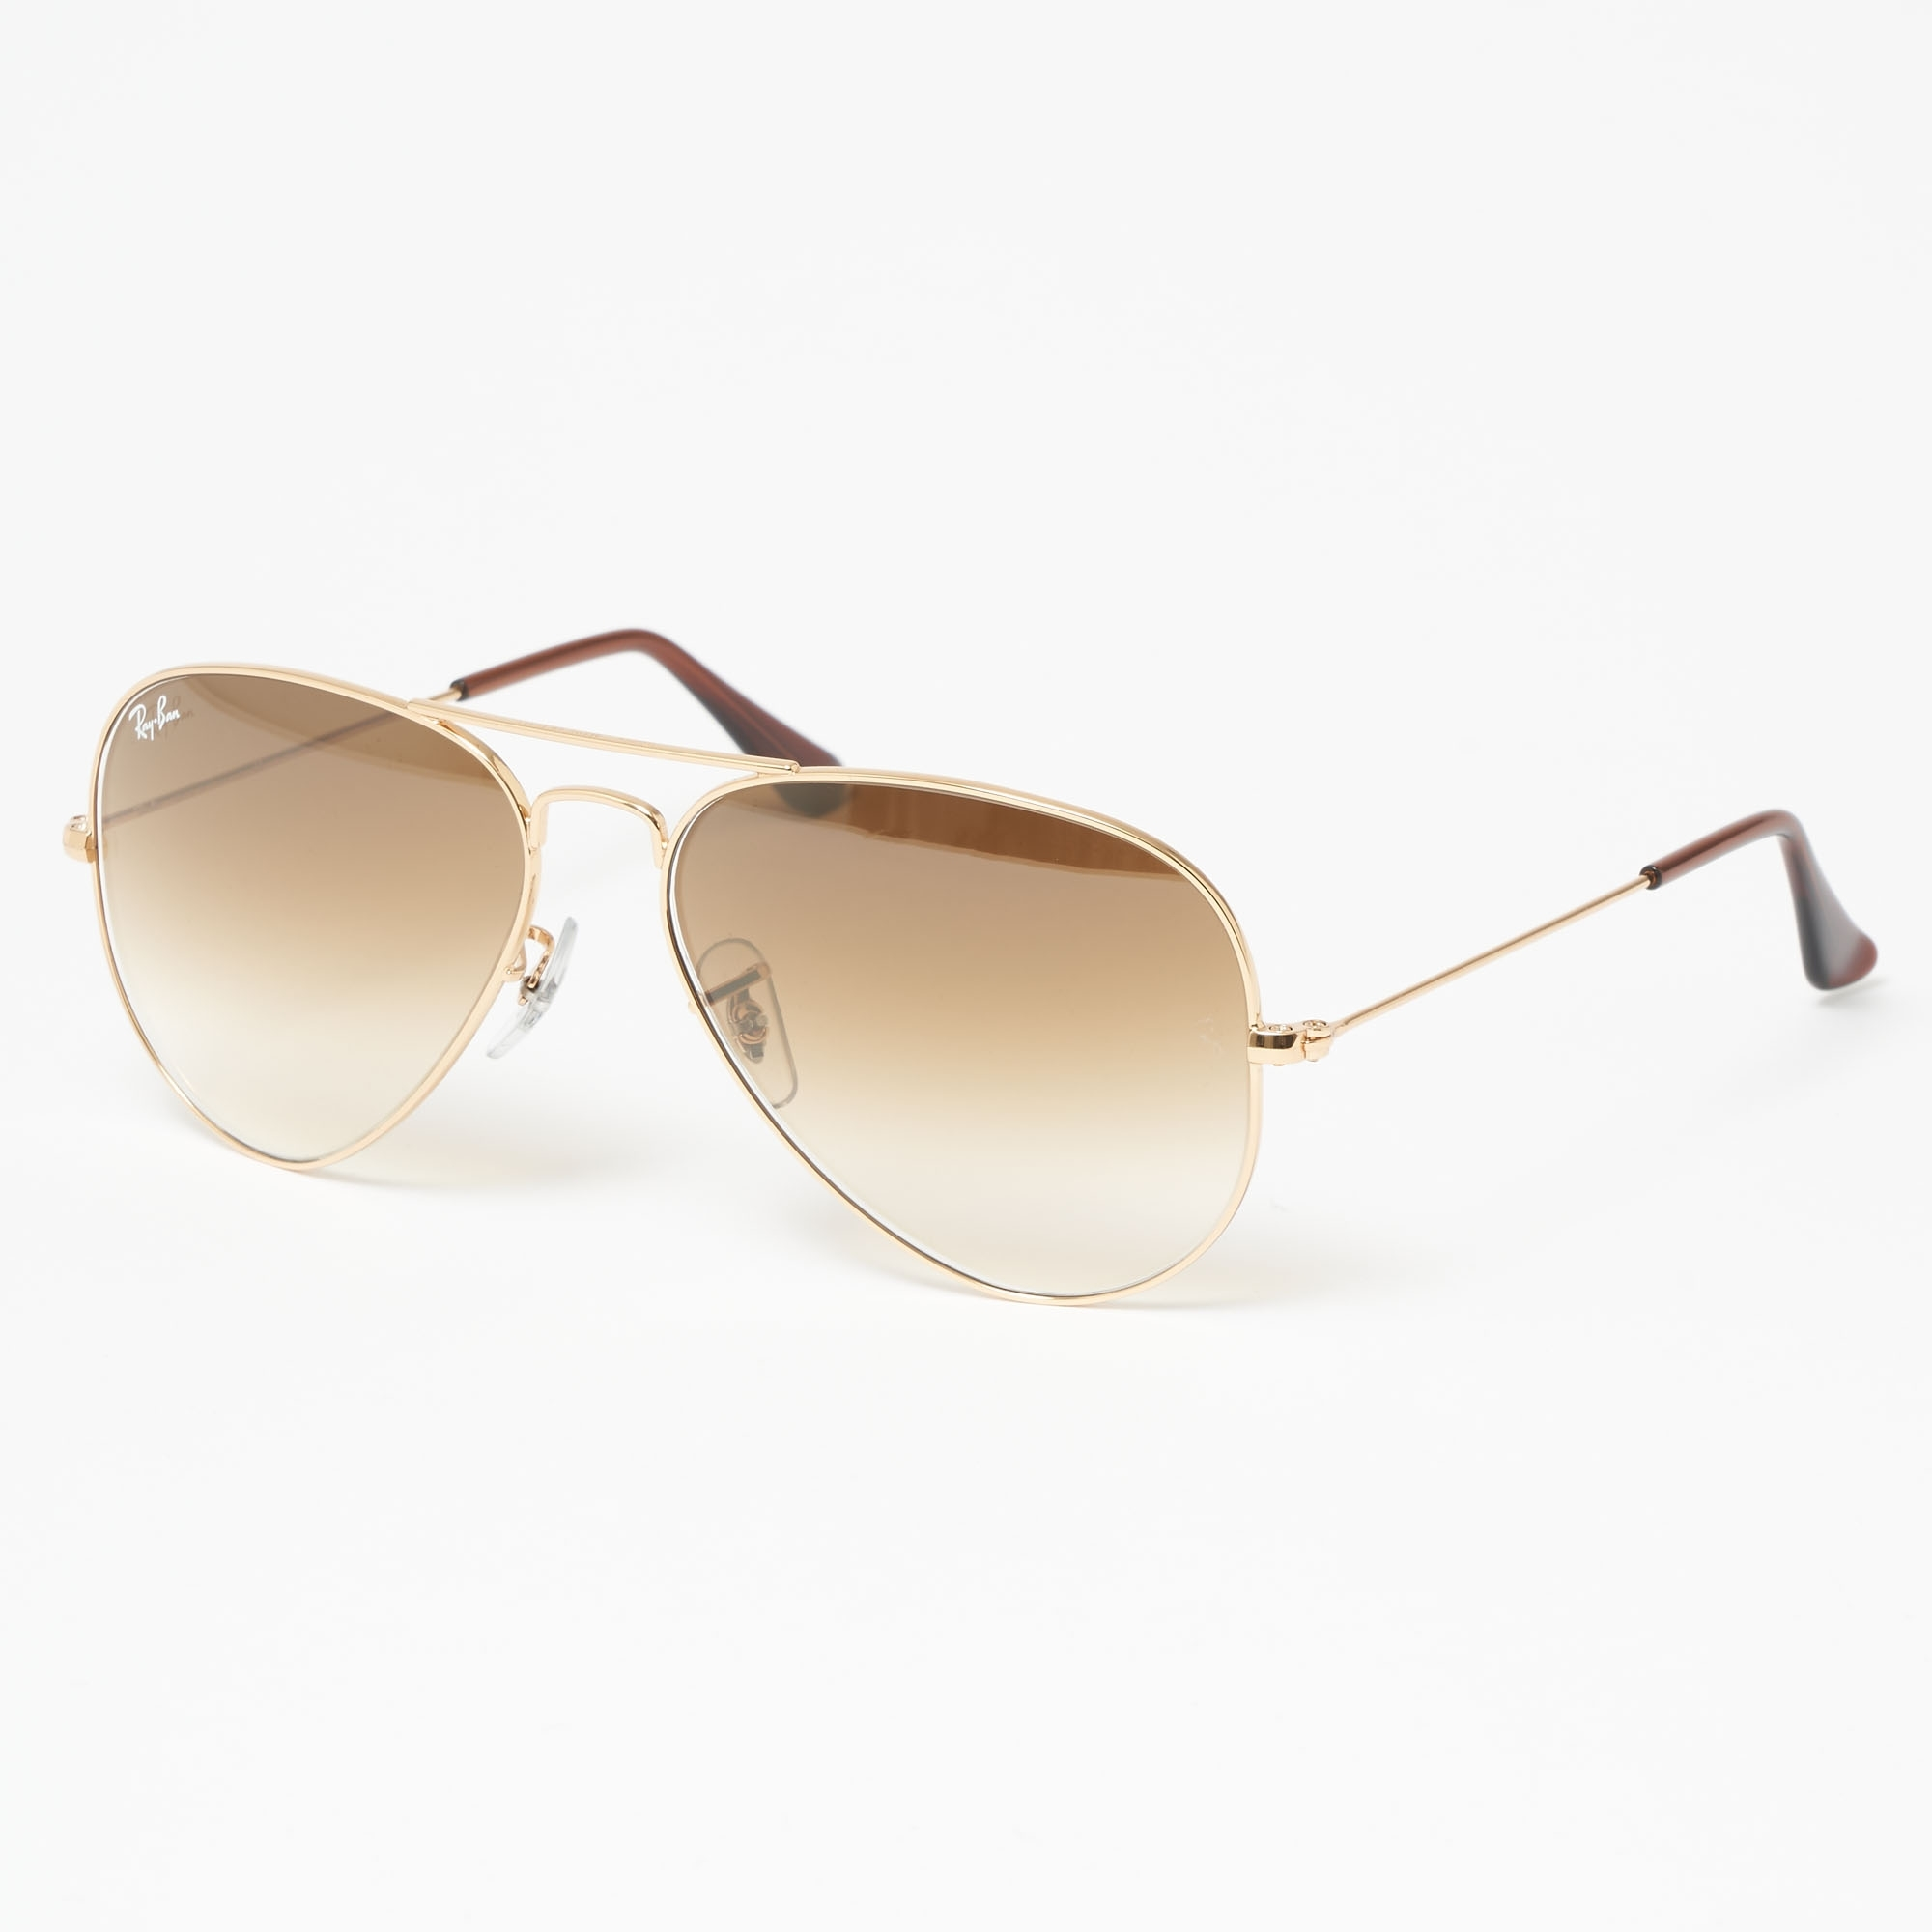 0c9bbfc3b82 Gold Aviator Gradient Sunglasses - Light Brown Gradient Lenses